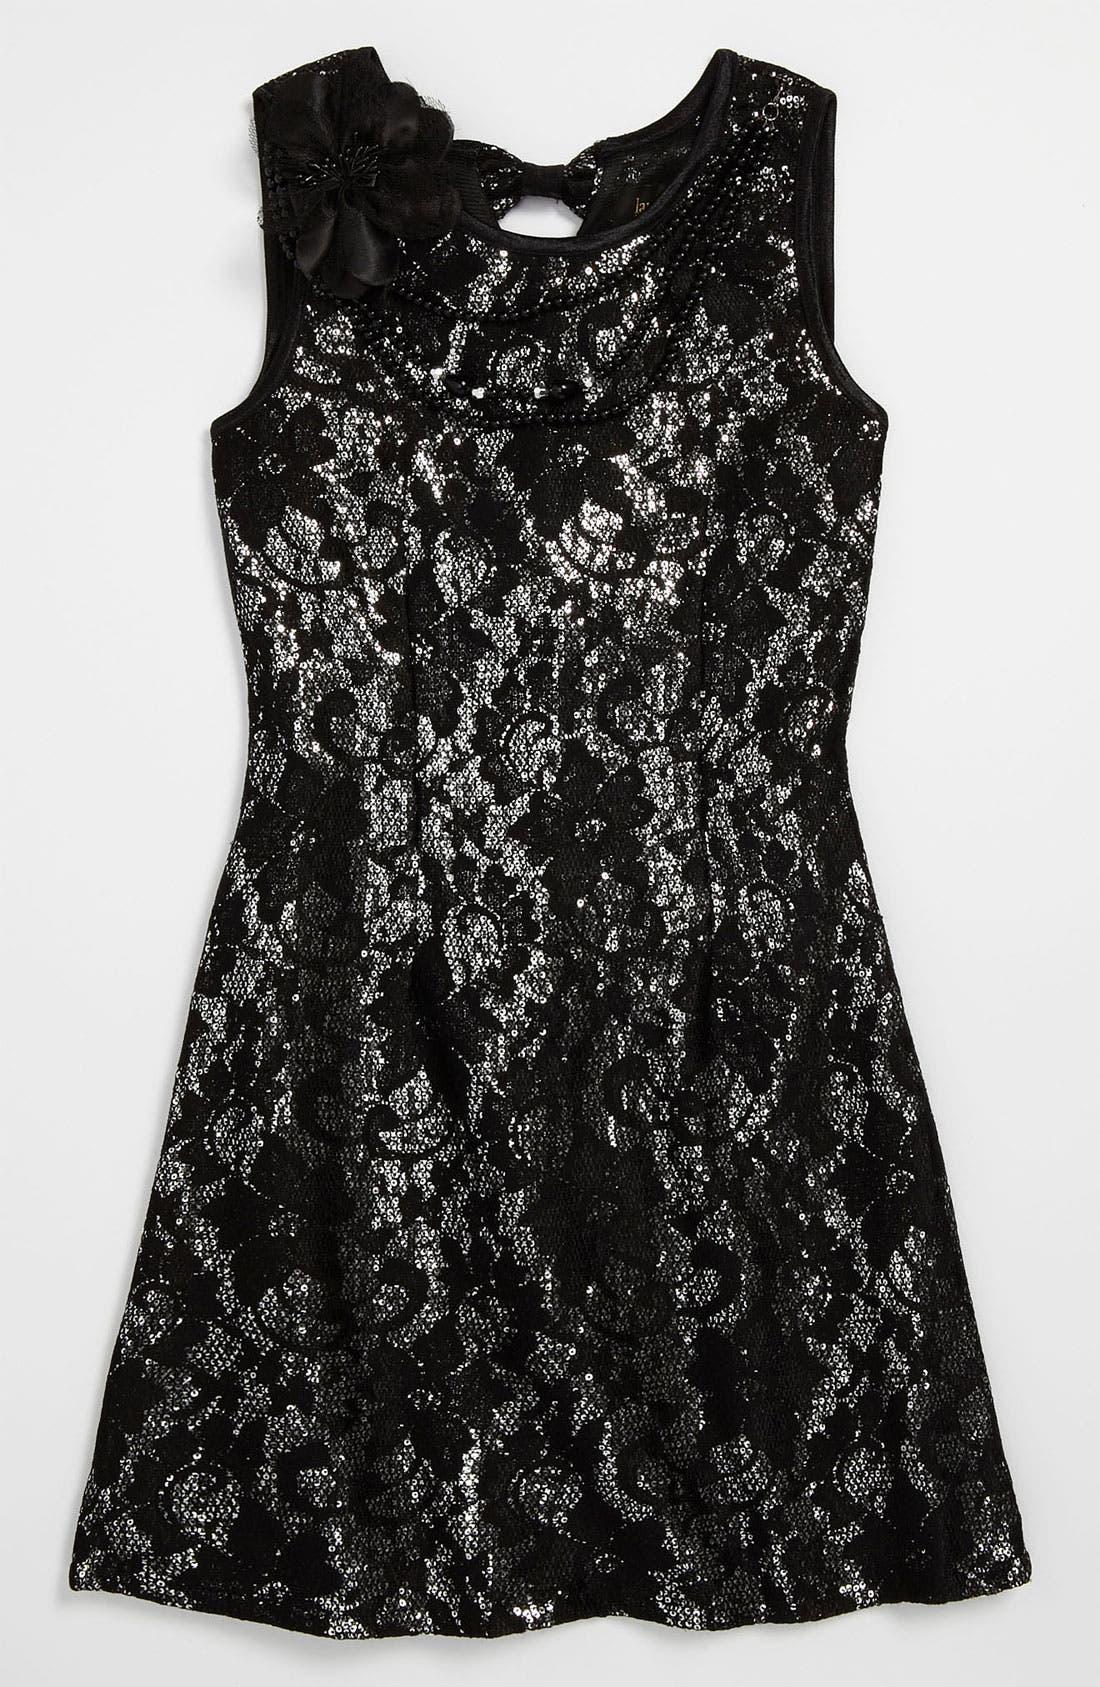 Alternate Image 1 Selected - Laundry by Shelli Segal 'Jessica' Dress (Big Girls)